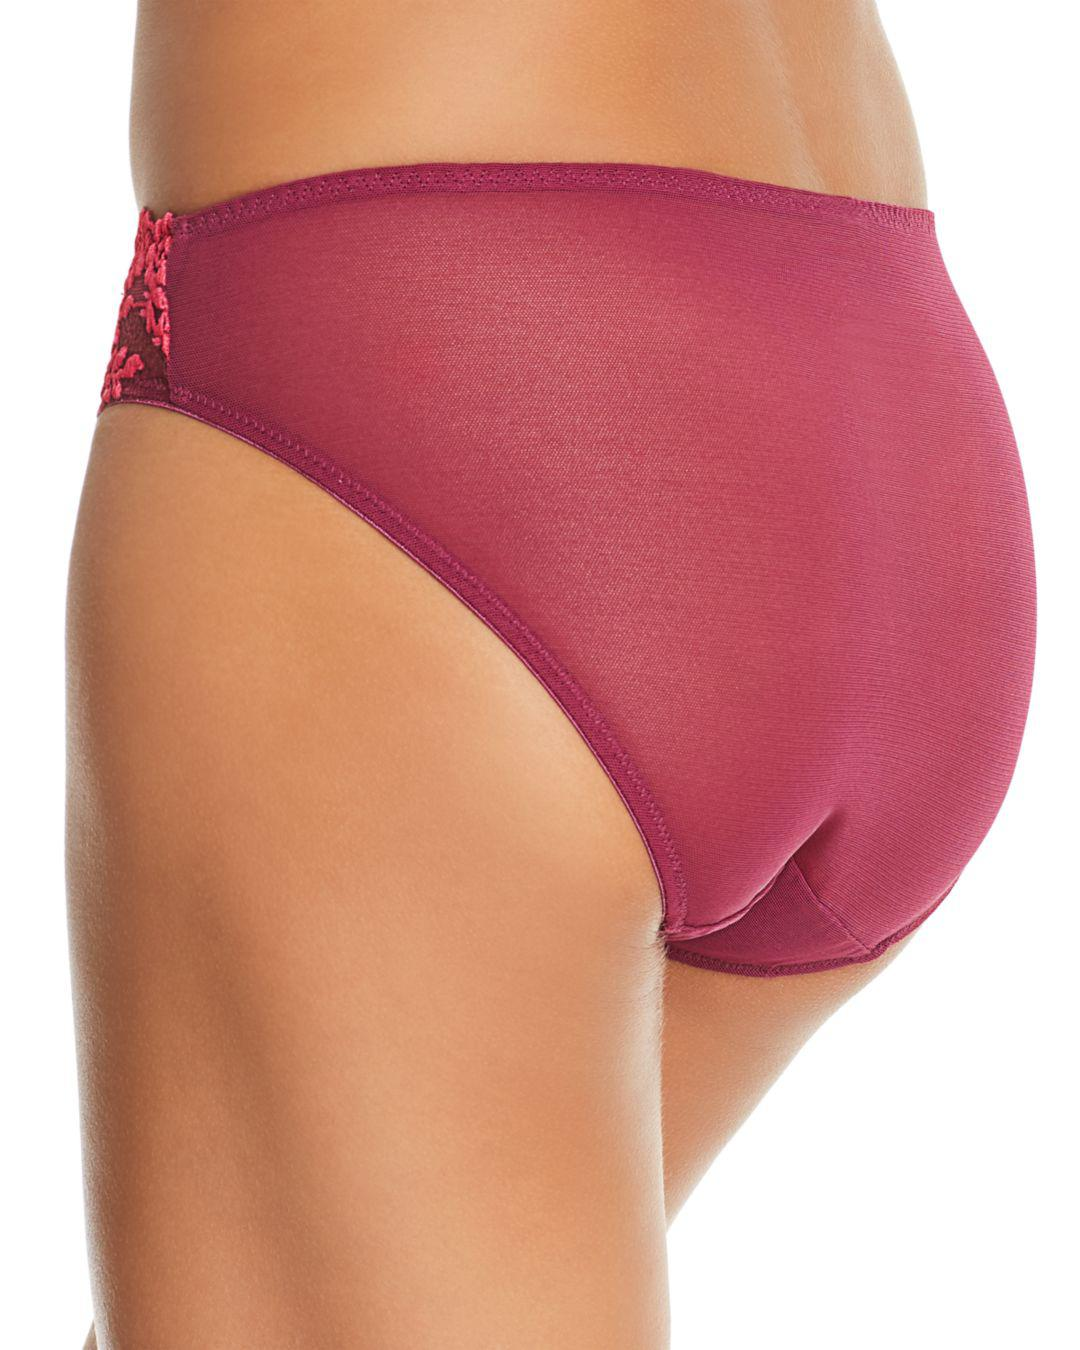 bc7213f94c1d0 Lyst - Wacoal Embrace Lace Bikini in Purple